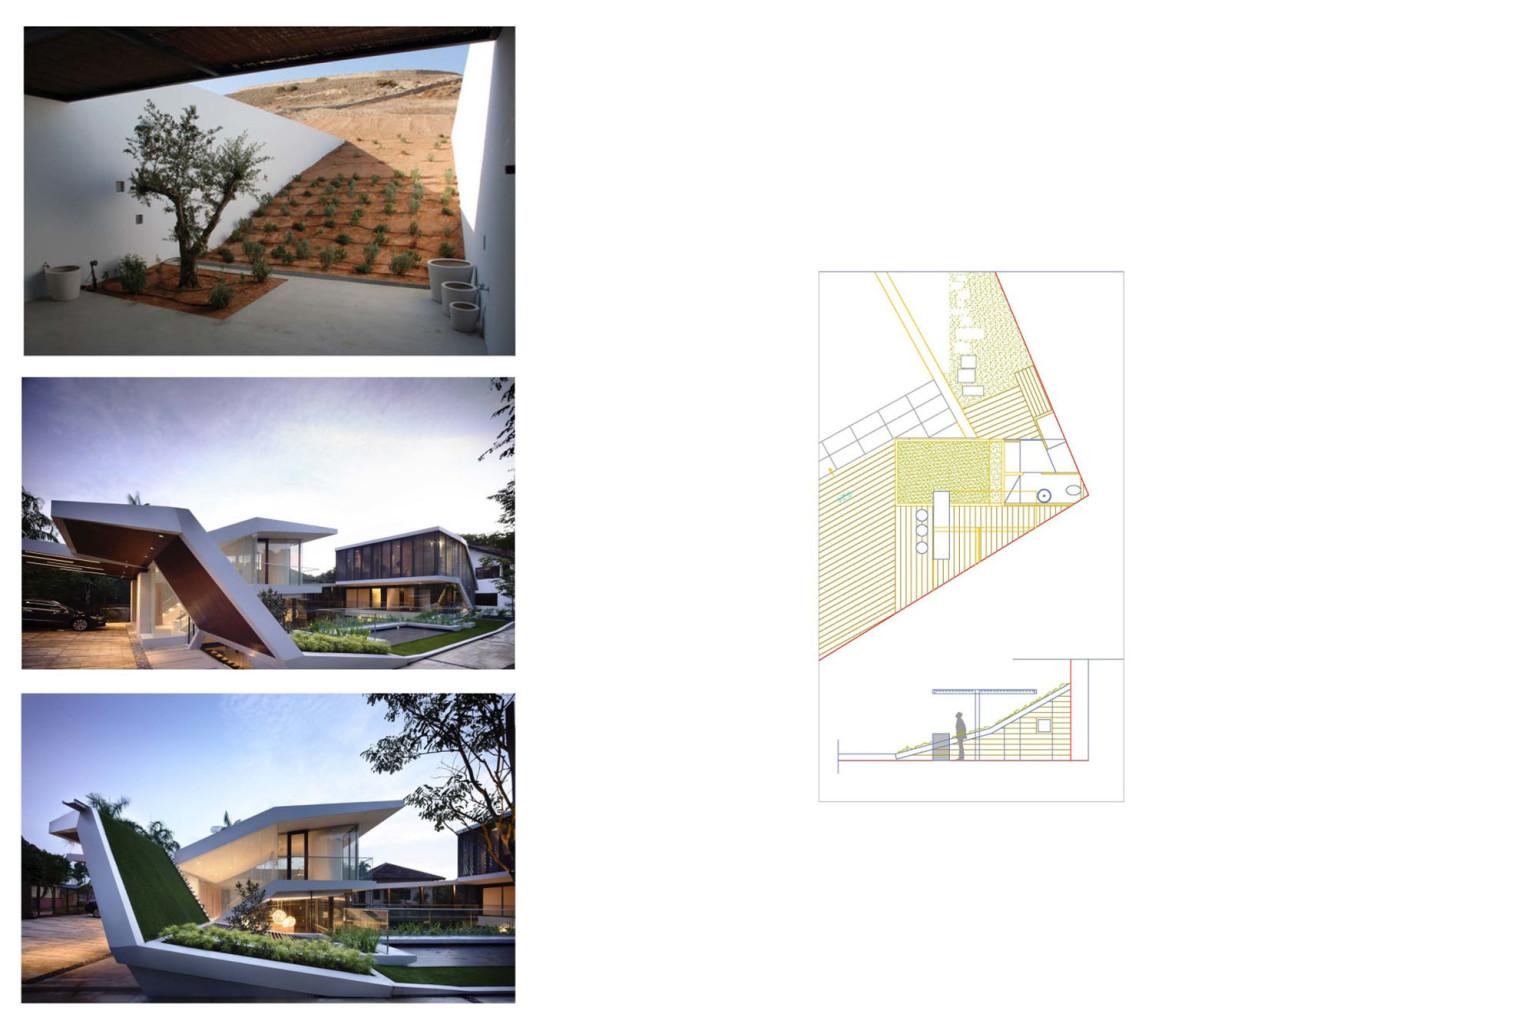 birguma-villa-print-2-a2_page_2-1